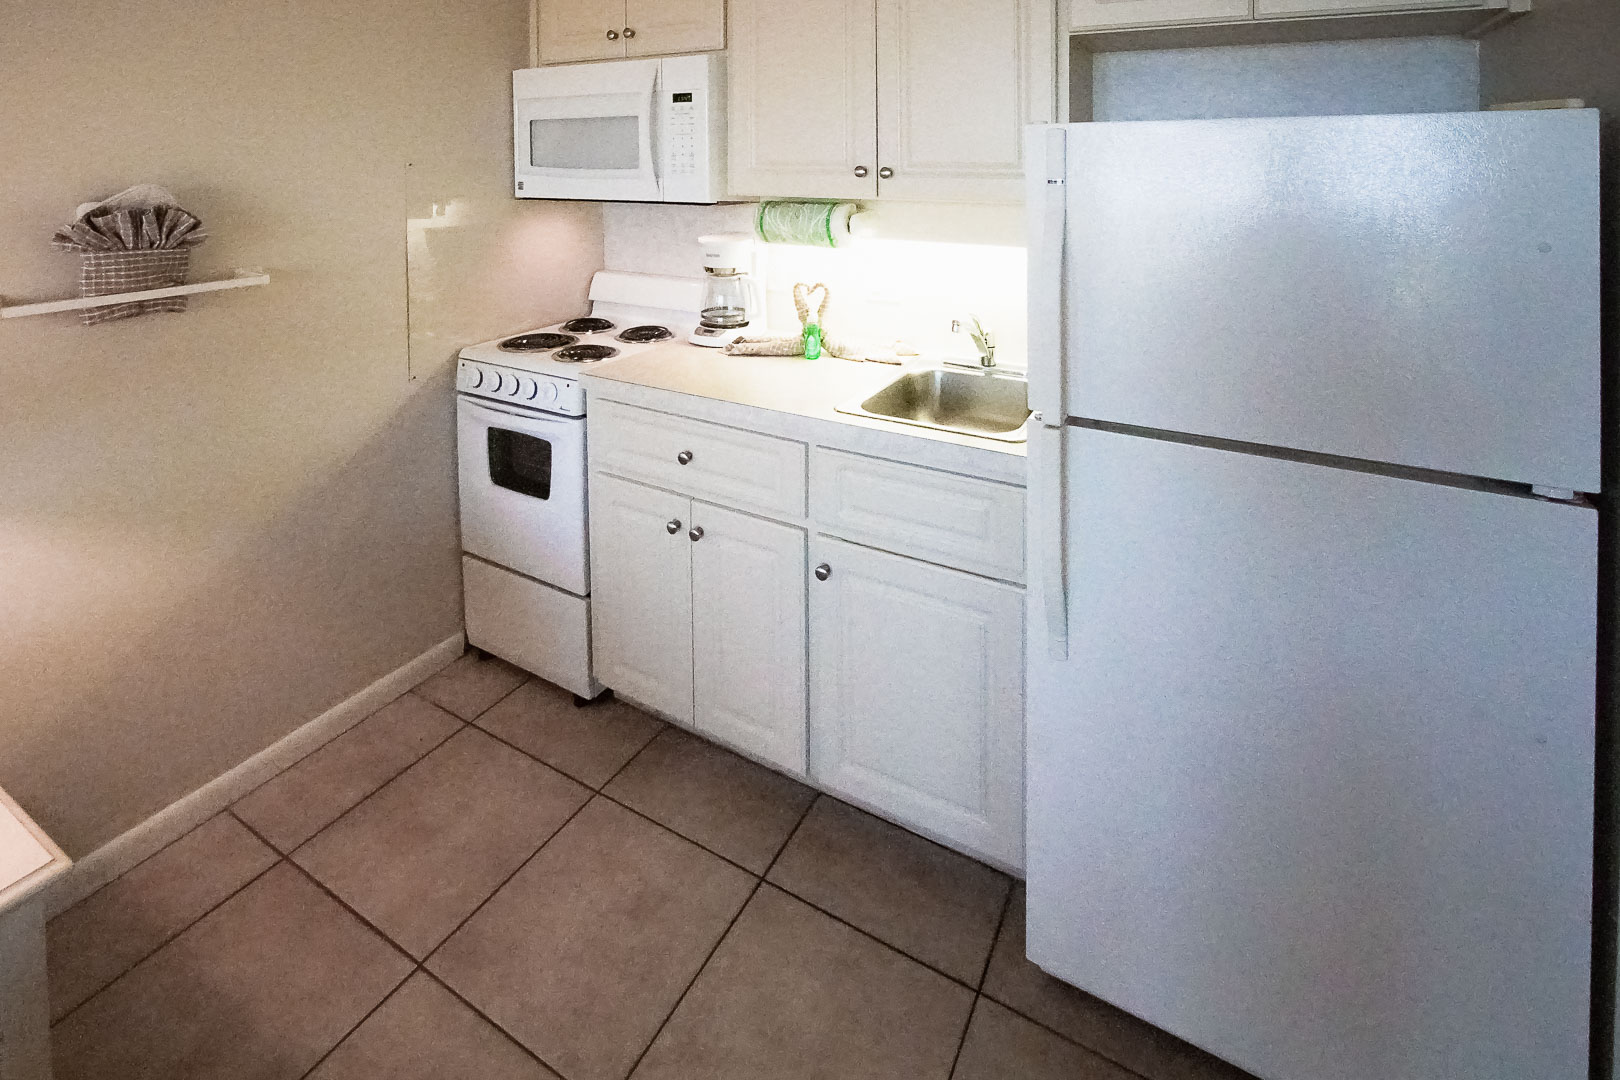 A small kitchen area at VRI's Bonita Resort and Club in Florida.